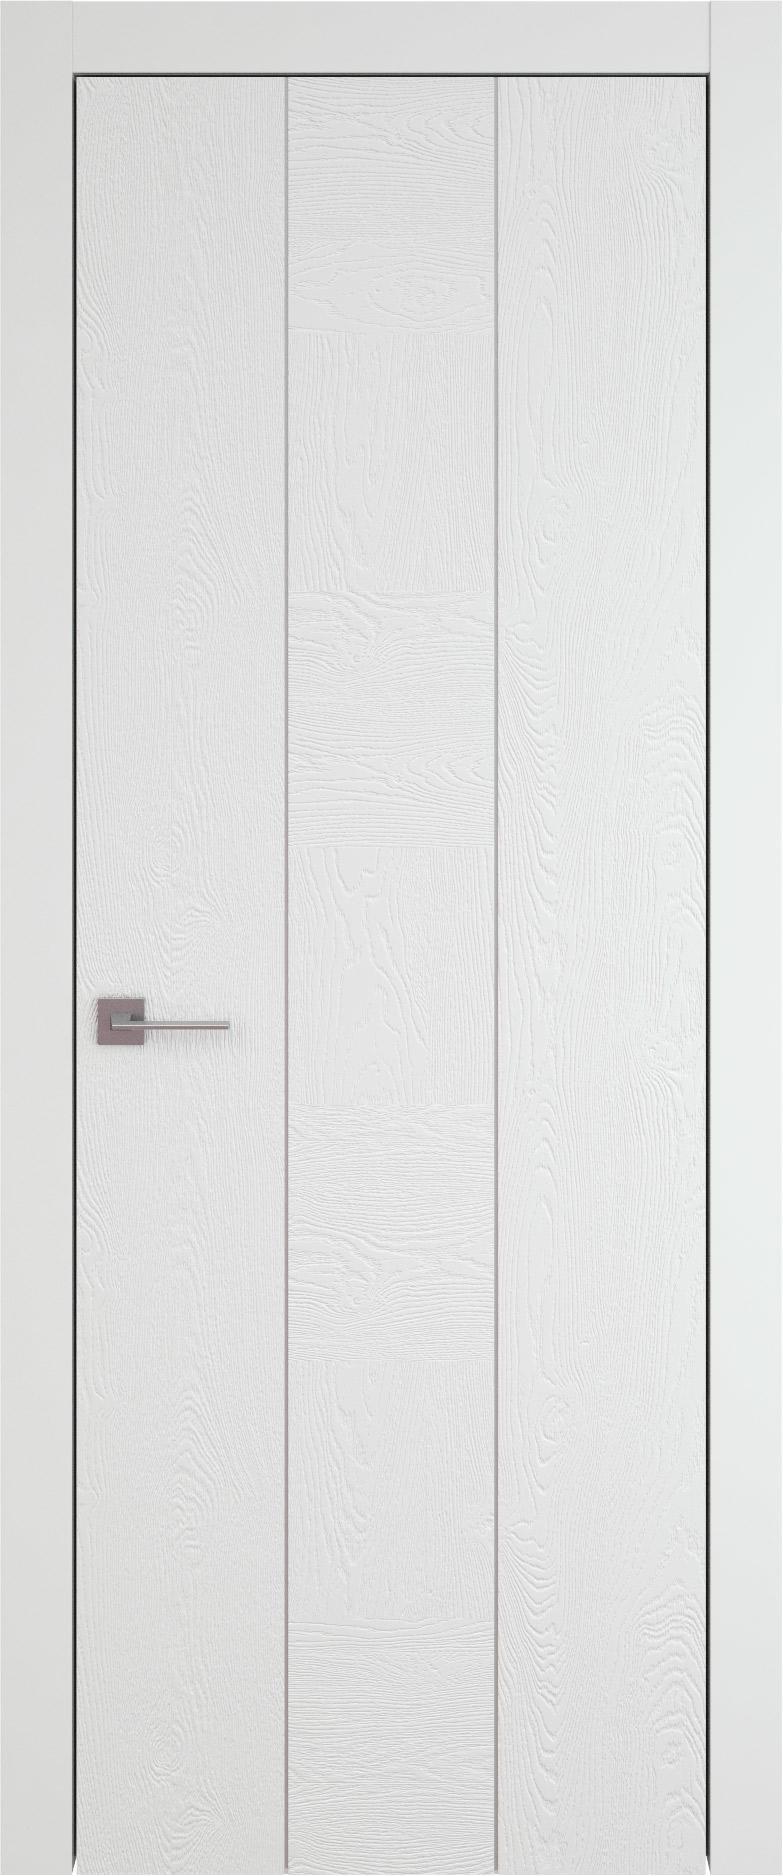 Tivoli Б-1 цвет - Белая эмаль по шпону (RAL 9003) Без стекла (ДГ)